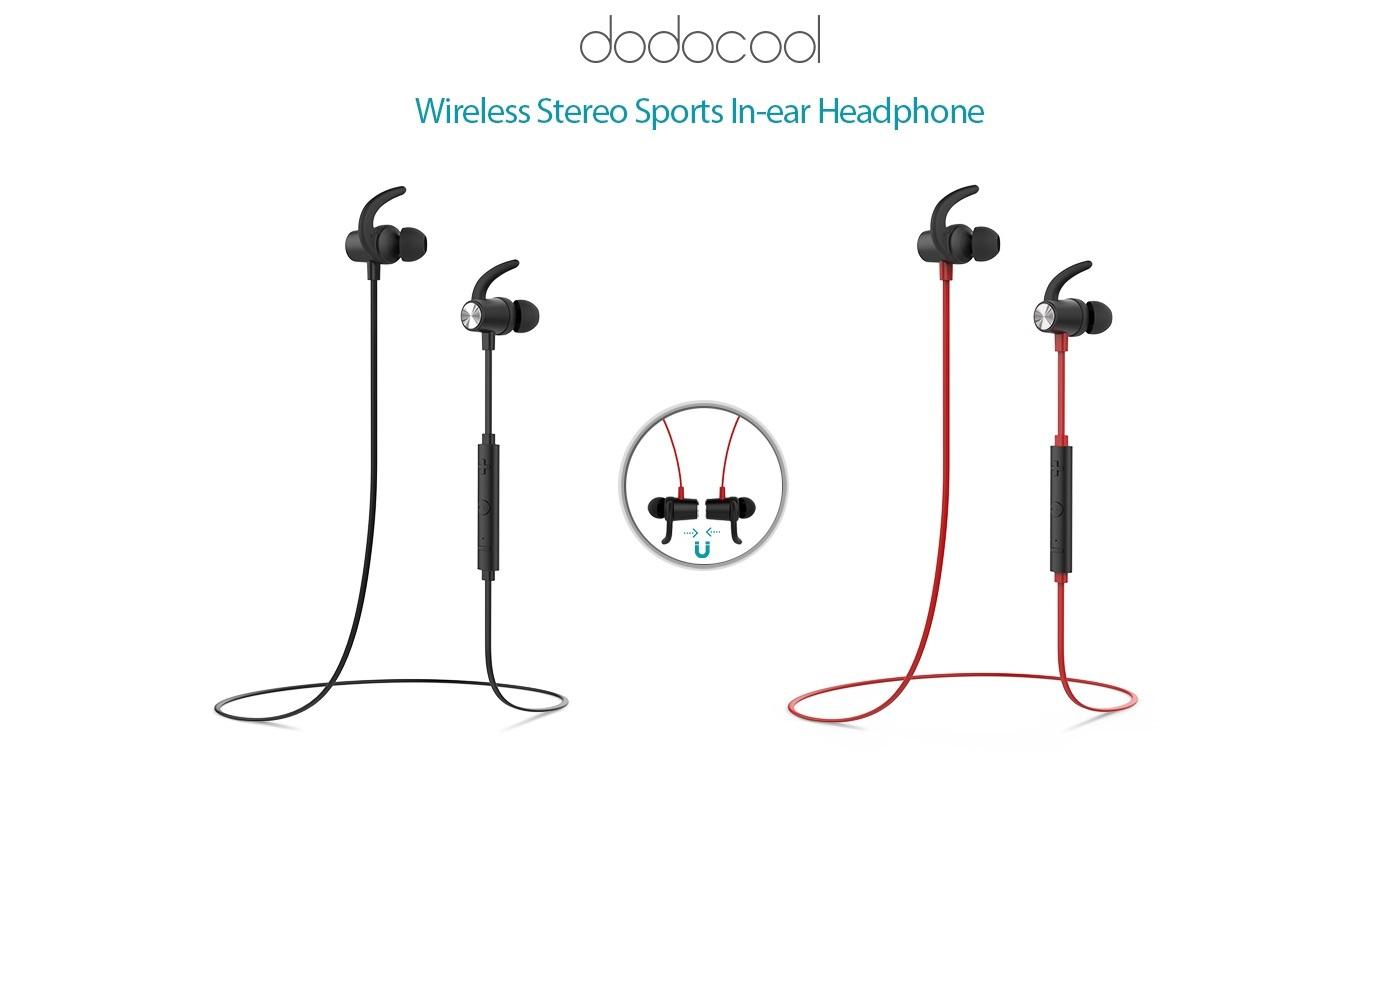 Auriculares Dodocool DA109R-1 Diseño